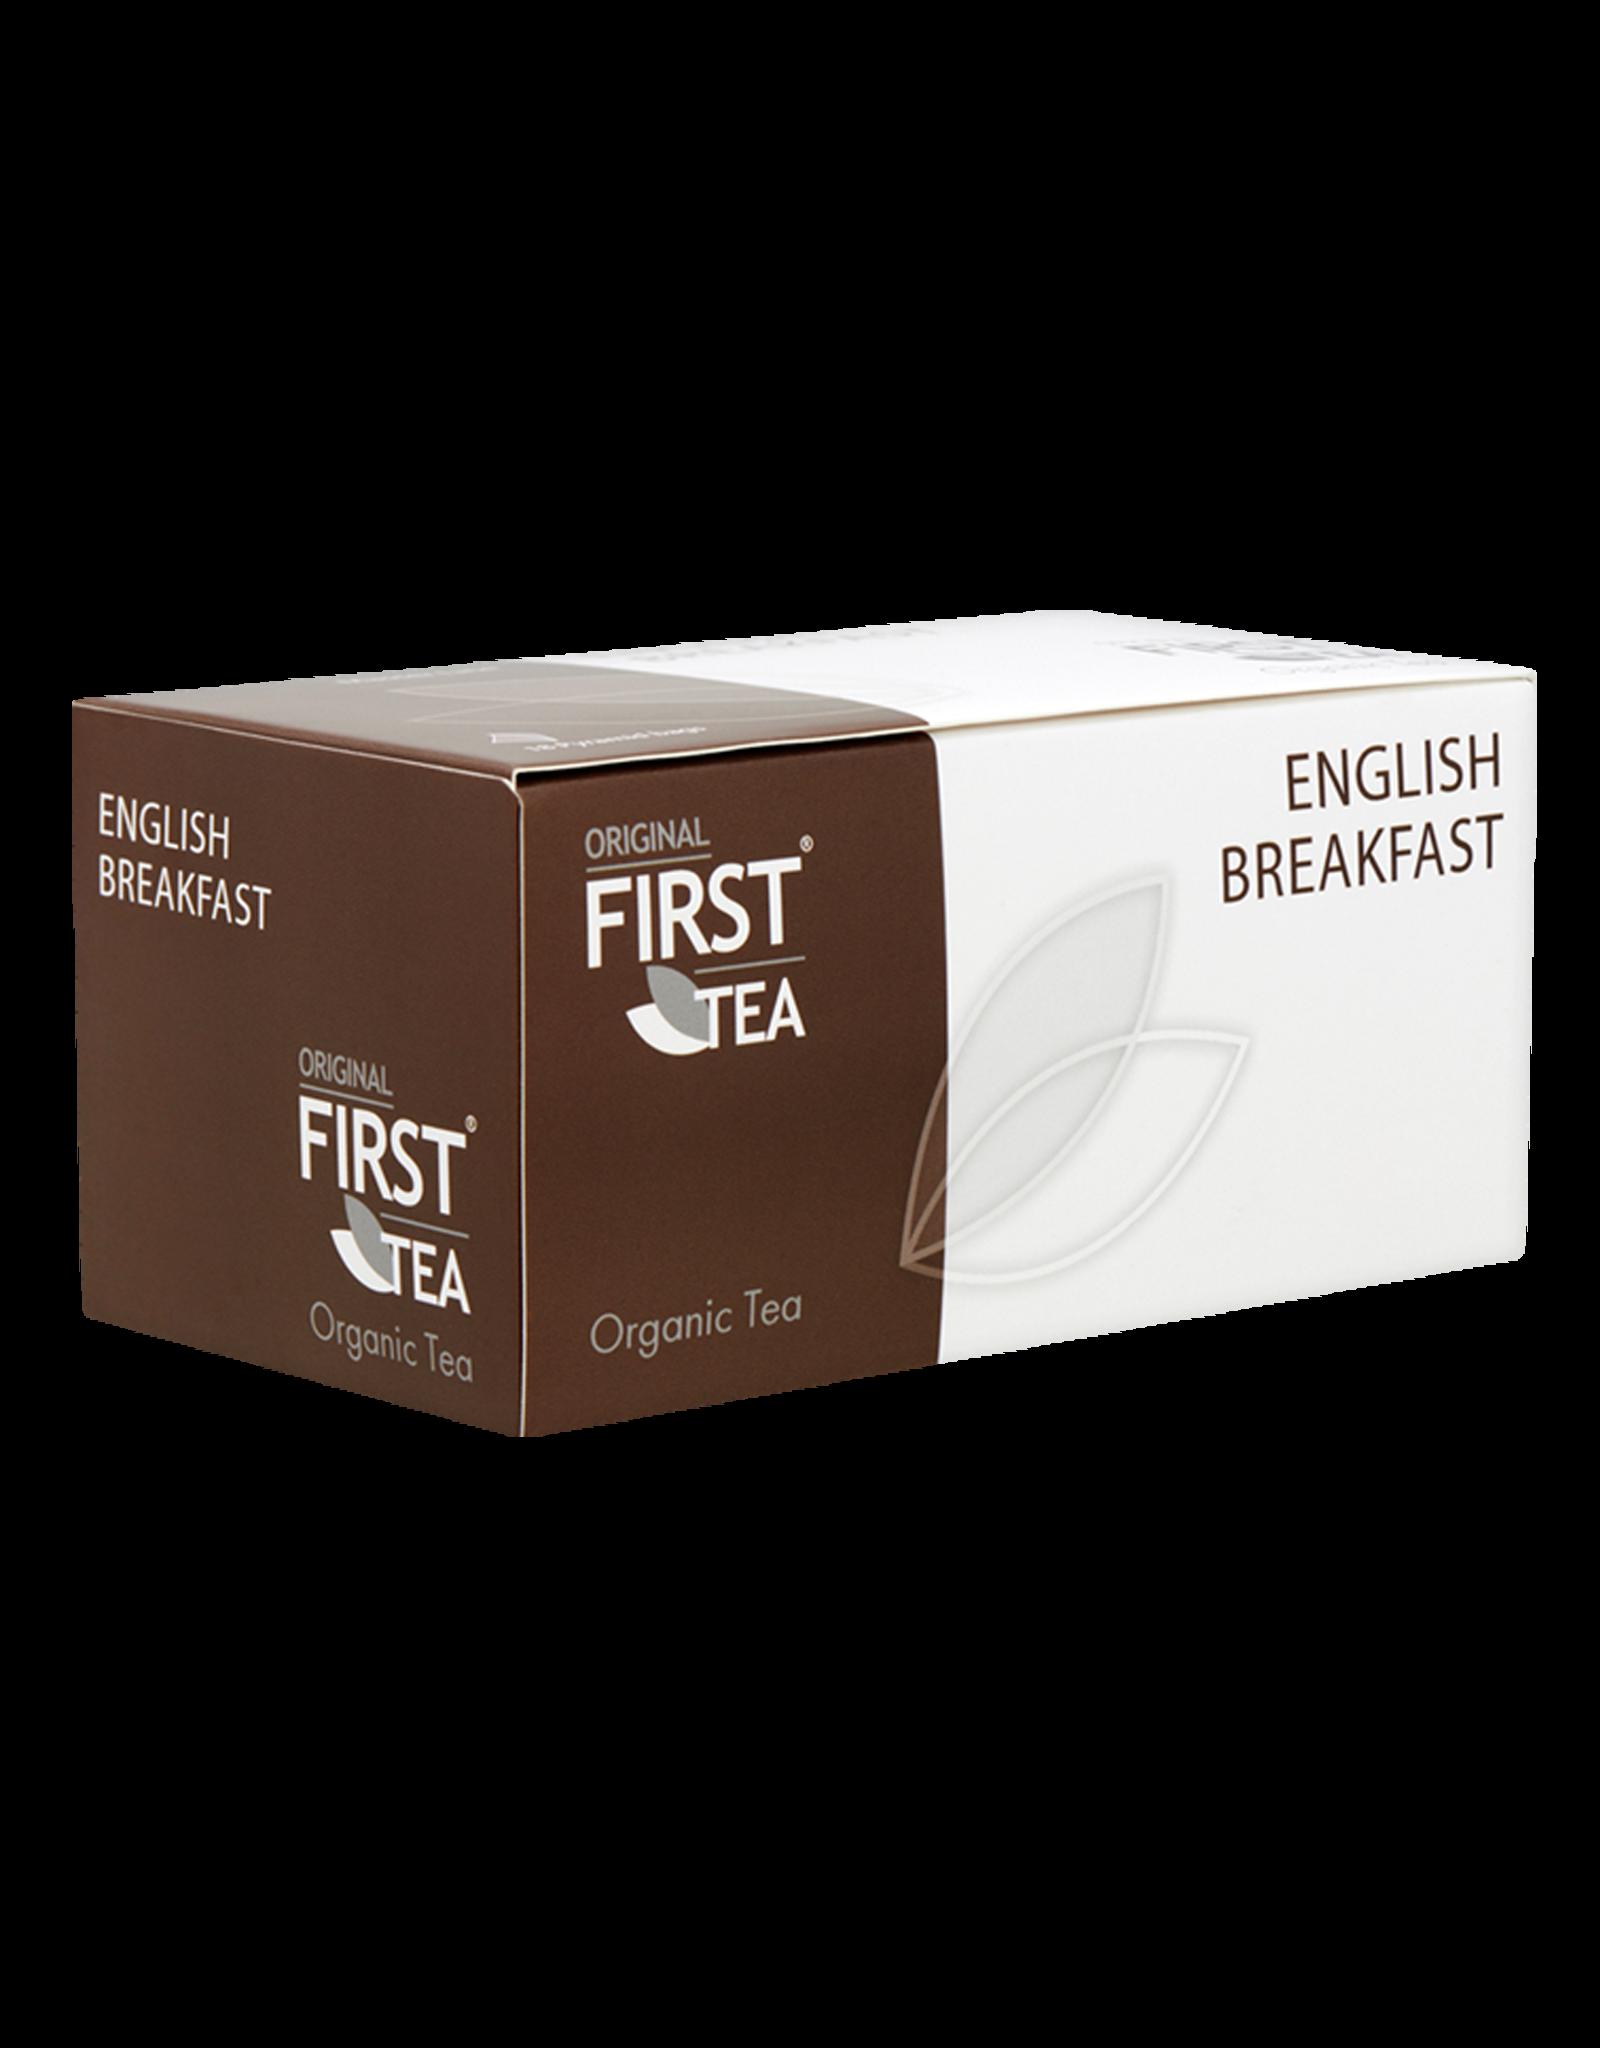 First Tea Master line Masterline English Breakfast